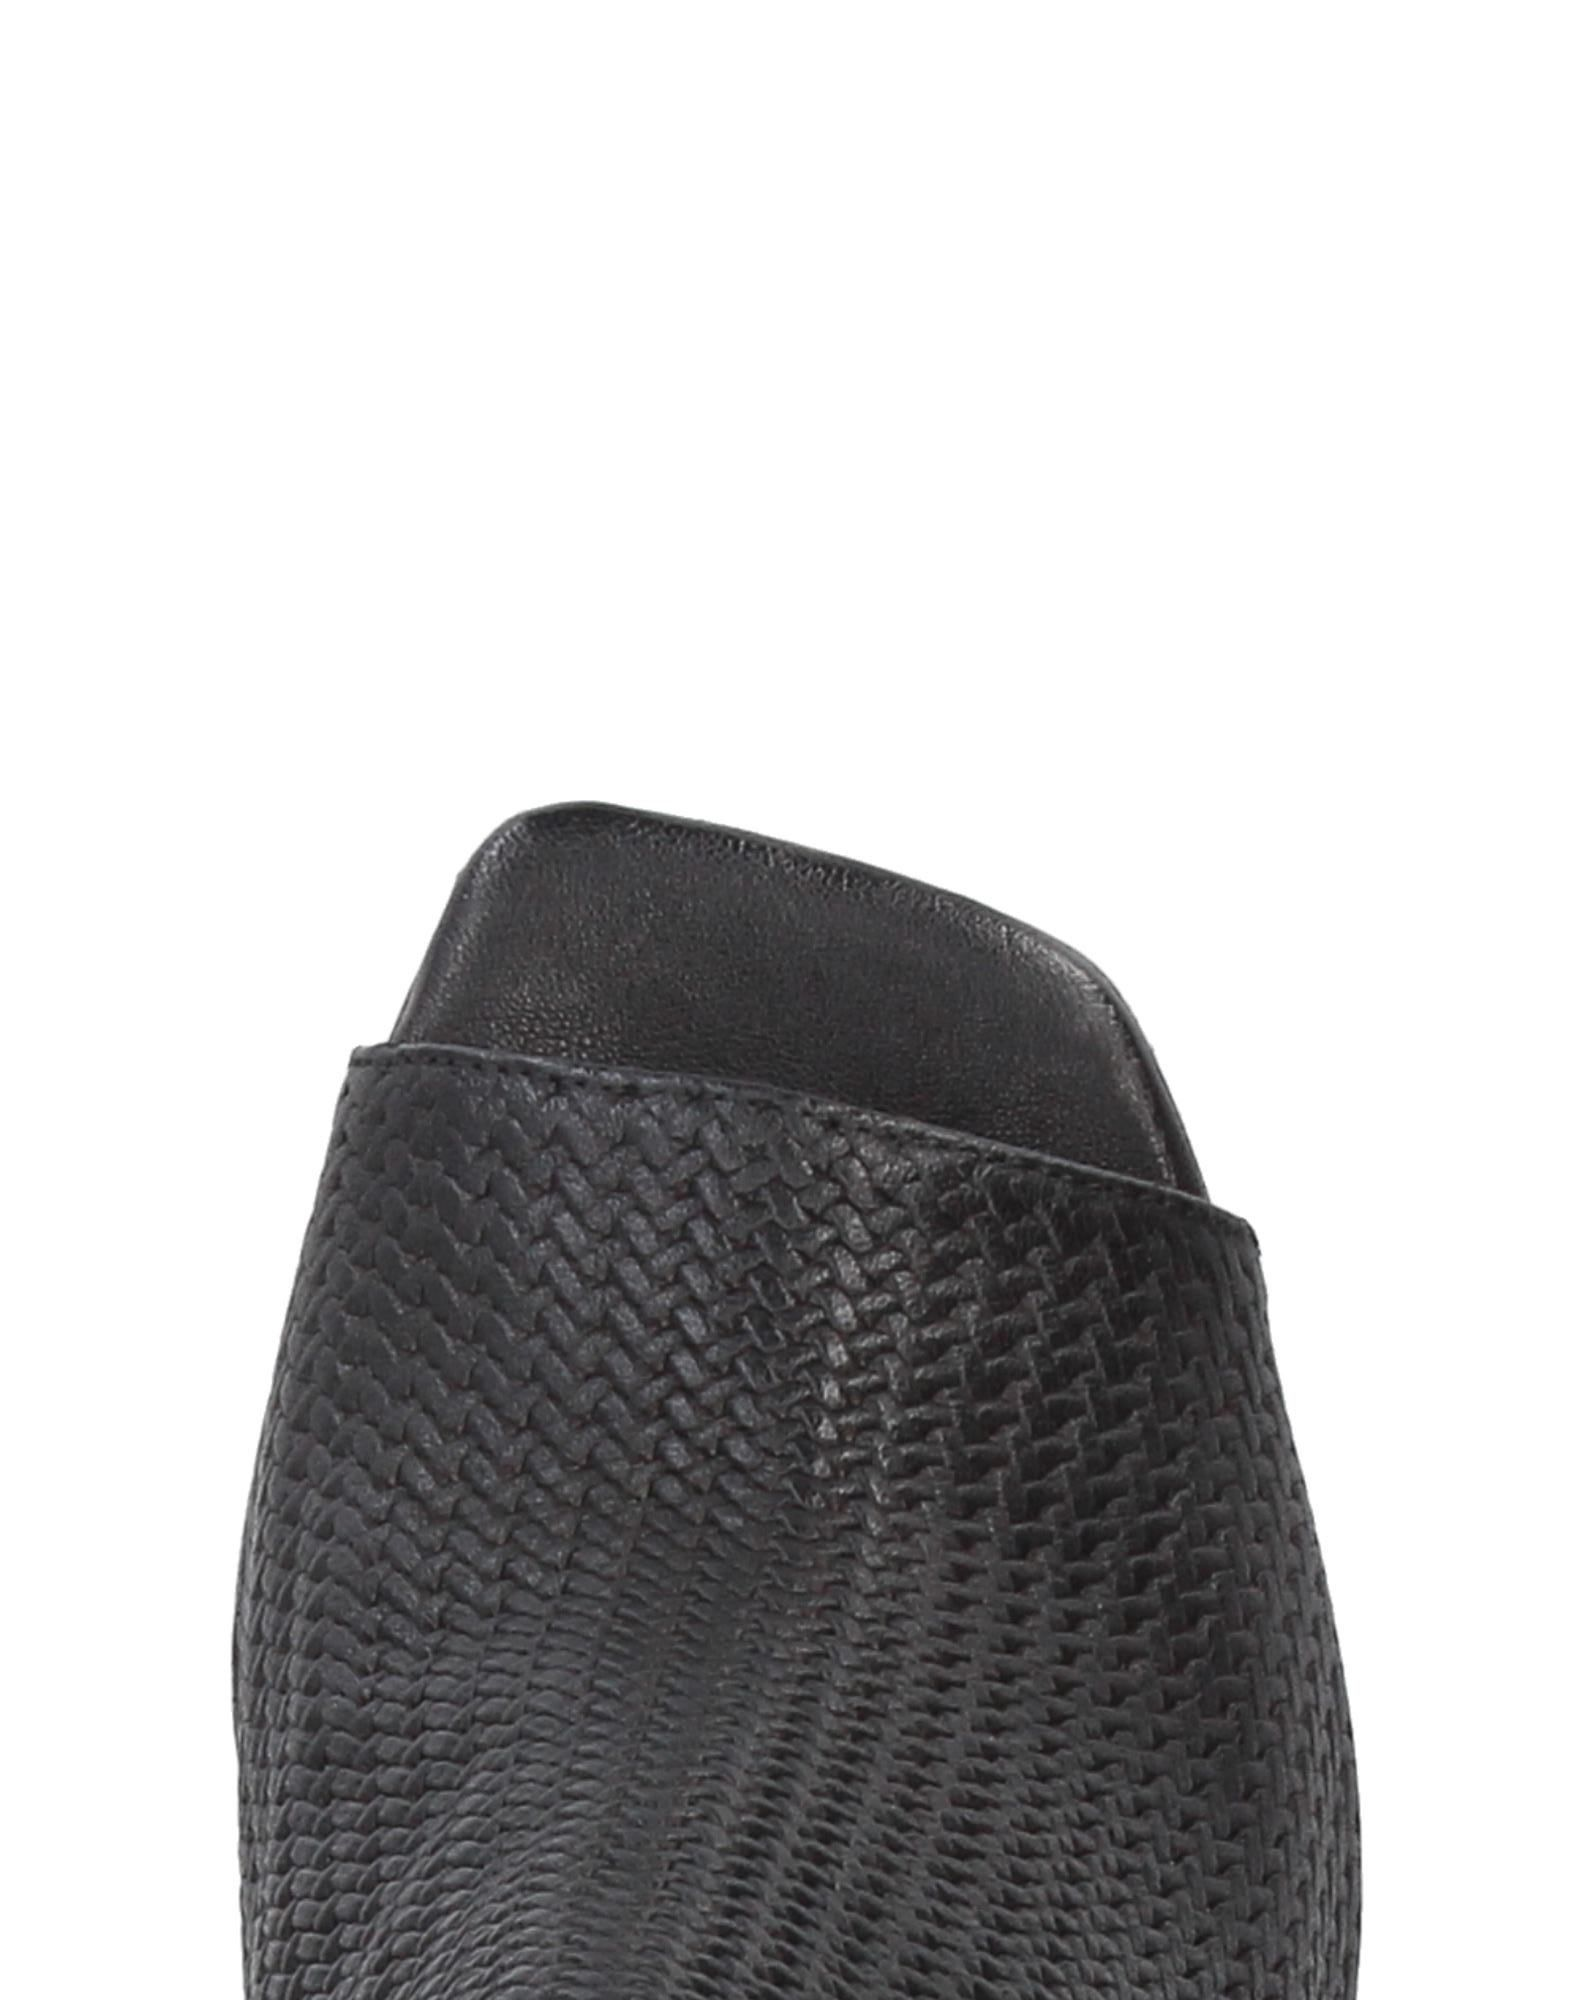 Laura Bellariva Sandalen Damen beliebte  11399970BQ Gute Qualität beliebte Damen Schuhe 4f6927